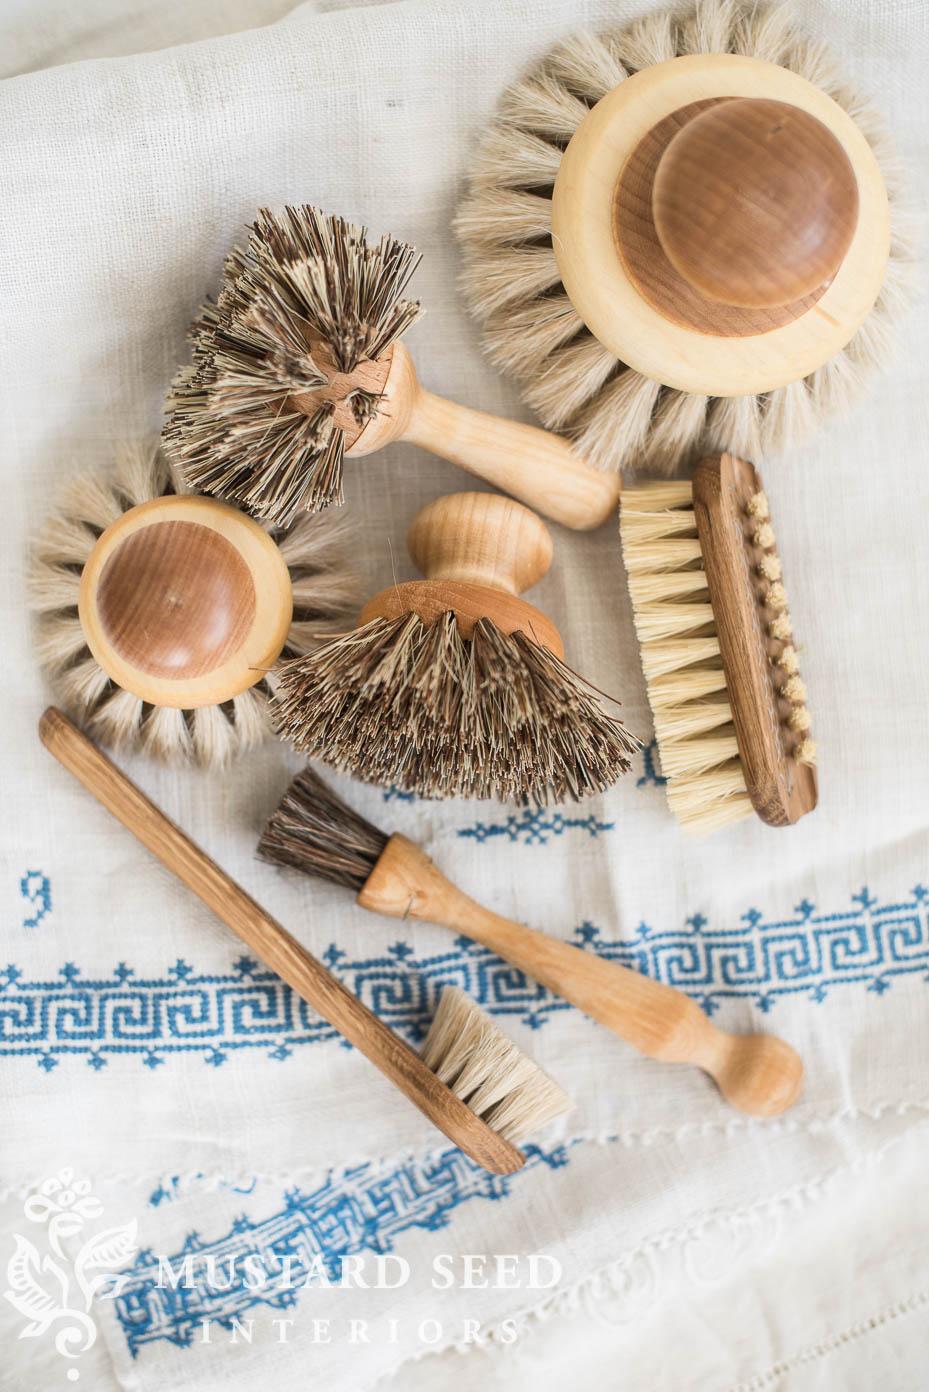 iris hantverk brushes   christmas gift ideas   miss mustard seed